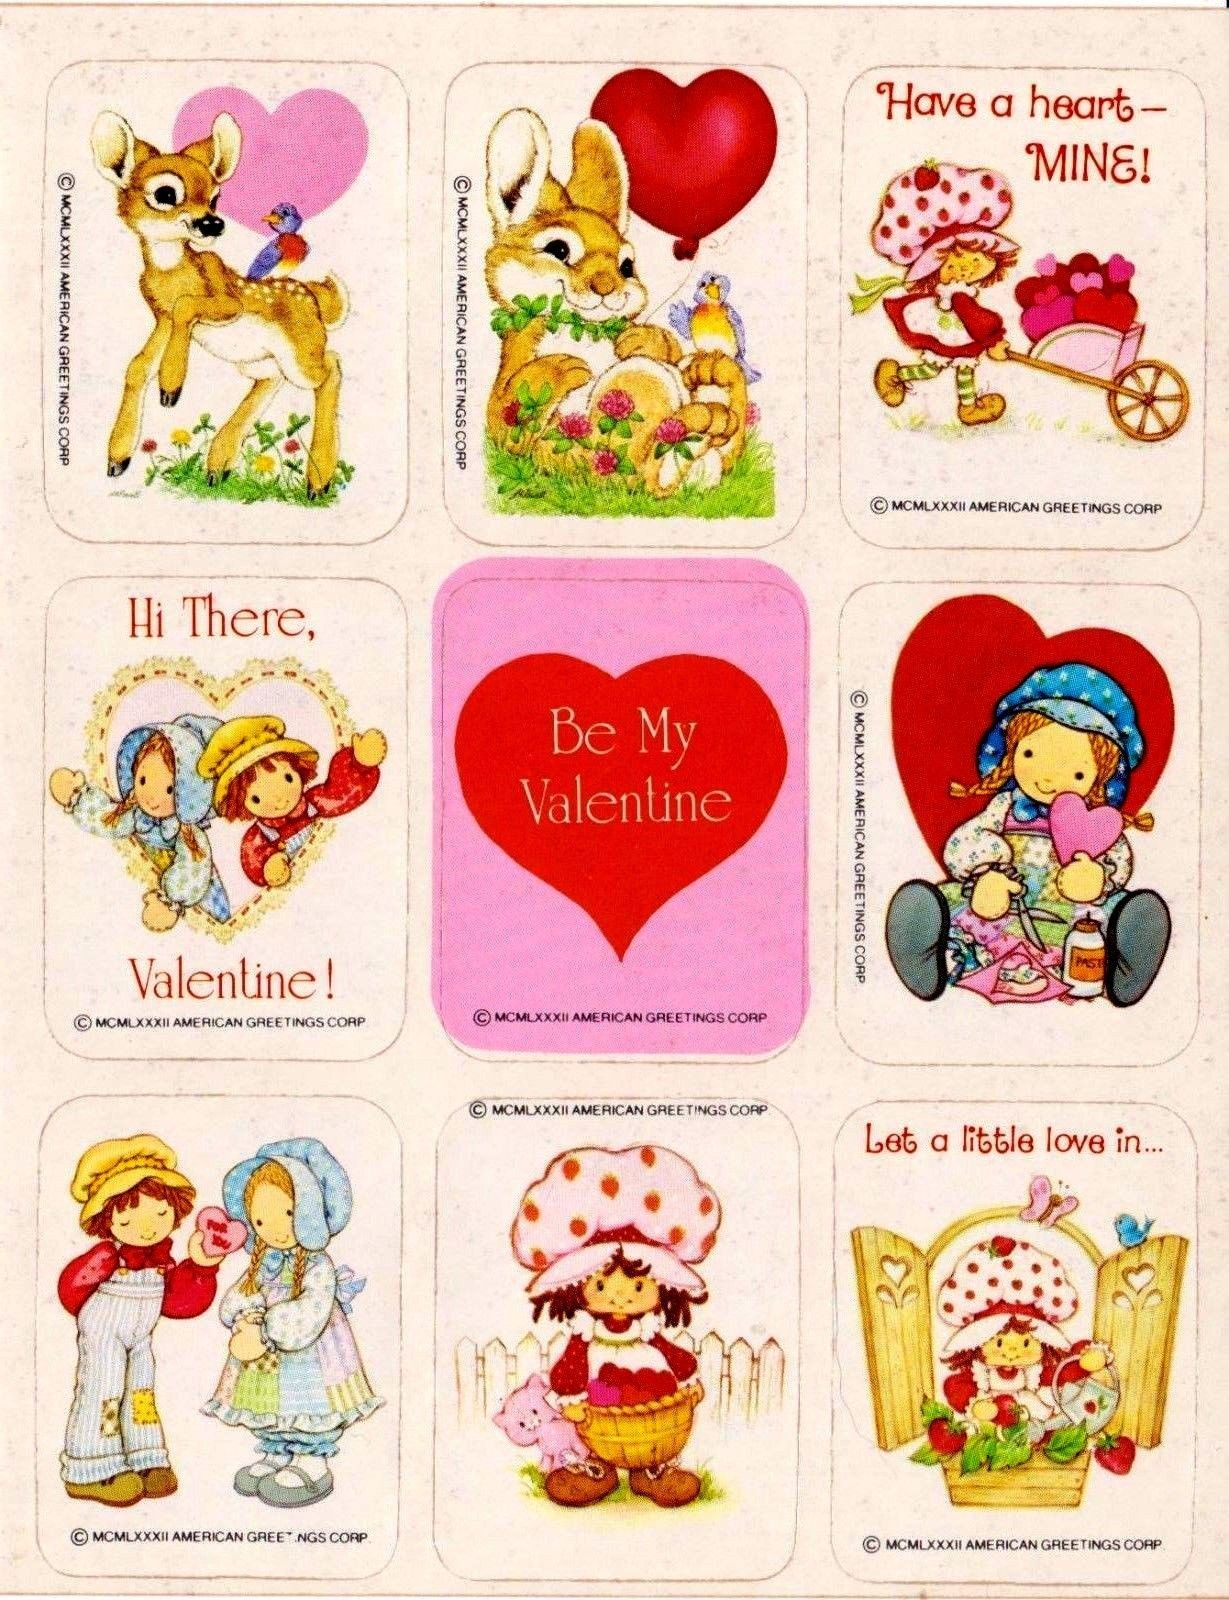 70s 80s Holly Hobbie Srawberry Shortcake Valentines Cards Holly Hobbie Valentine Stickers Strawberry Shortcake Doll